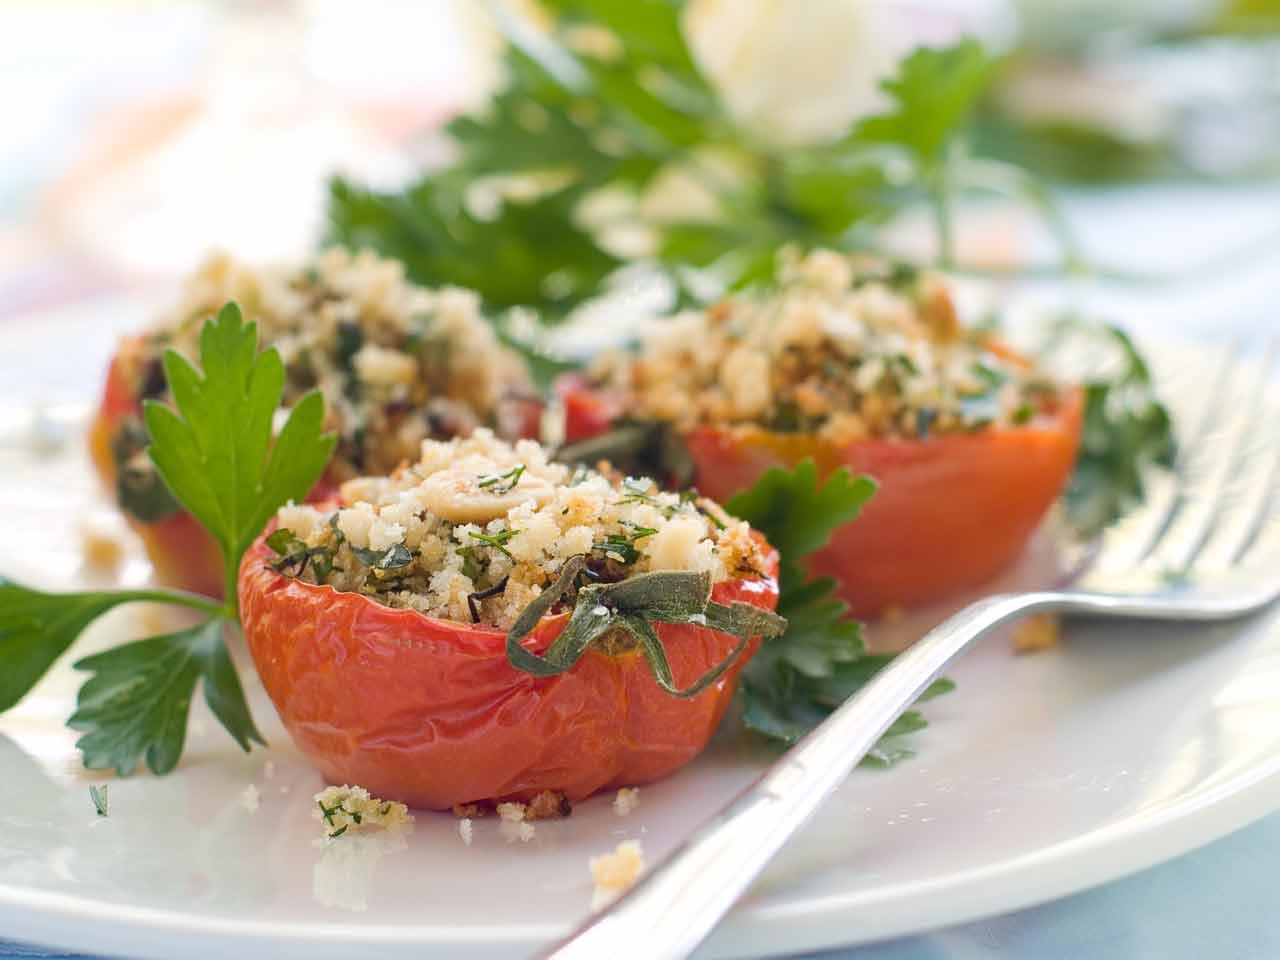 Provençale stuffed tomatoes